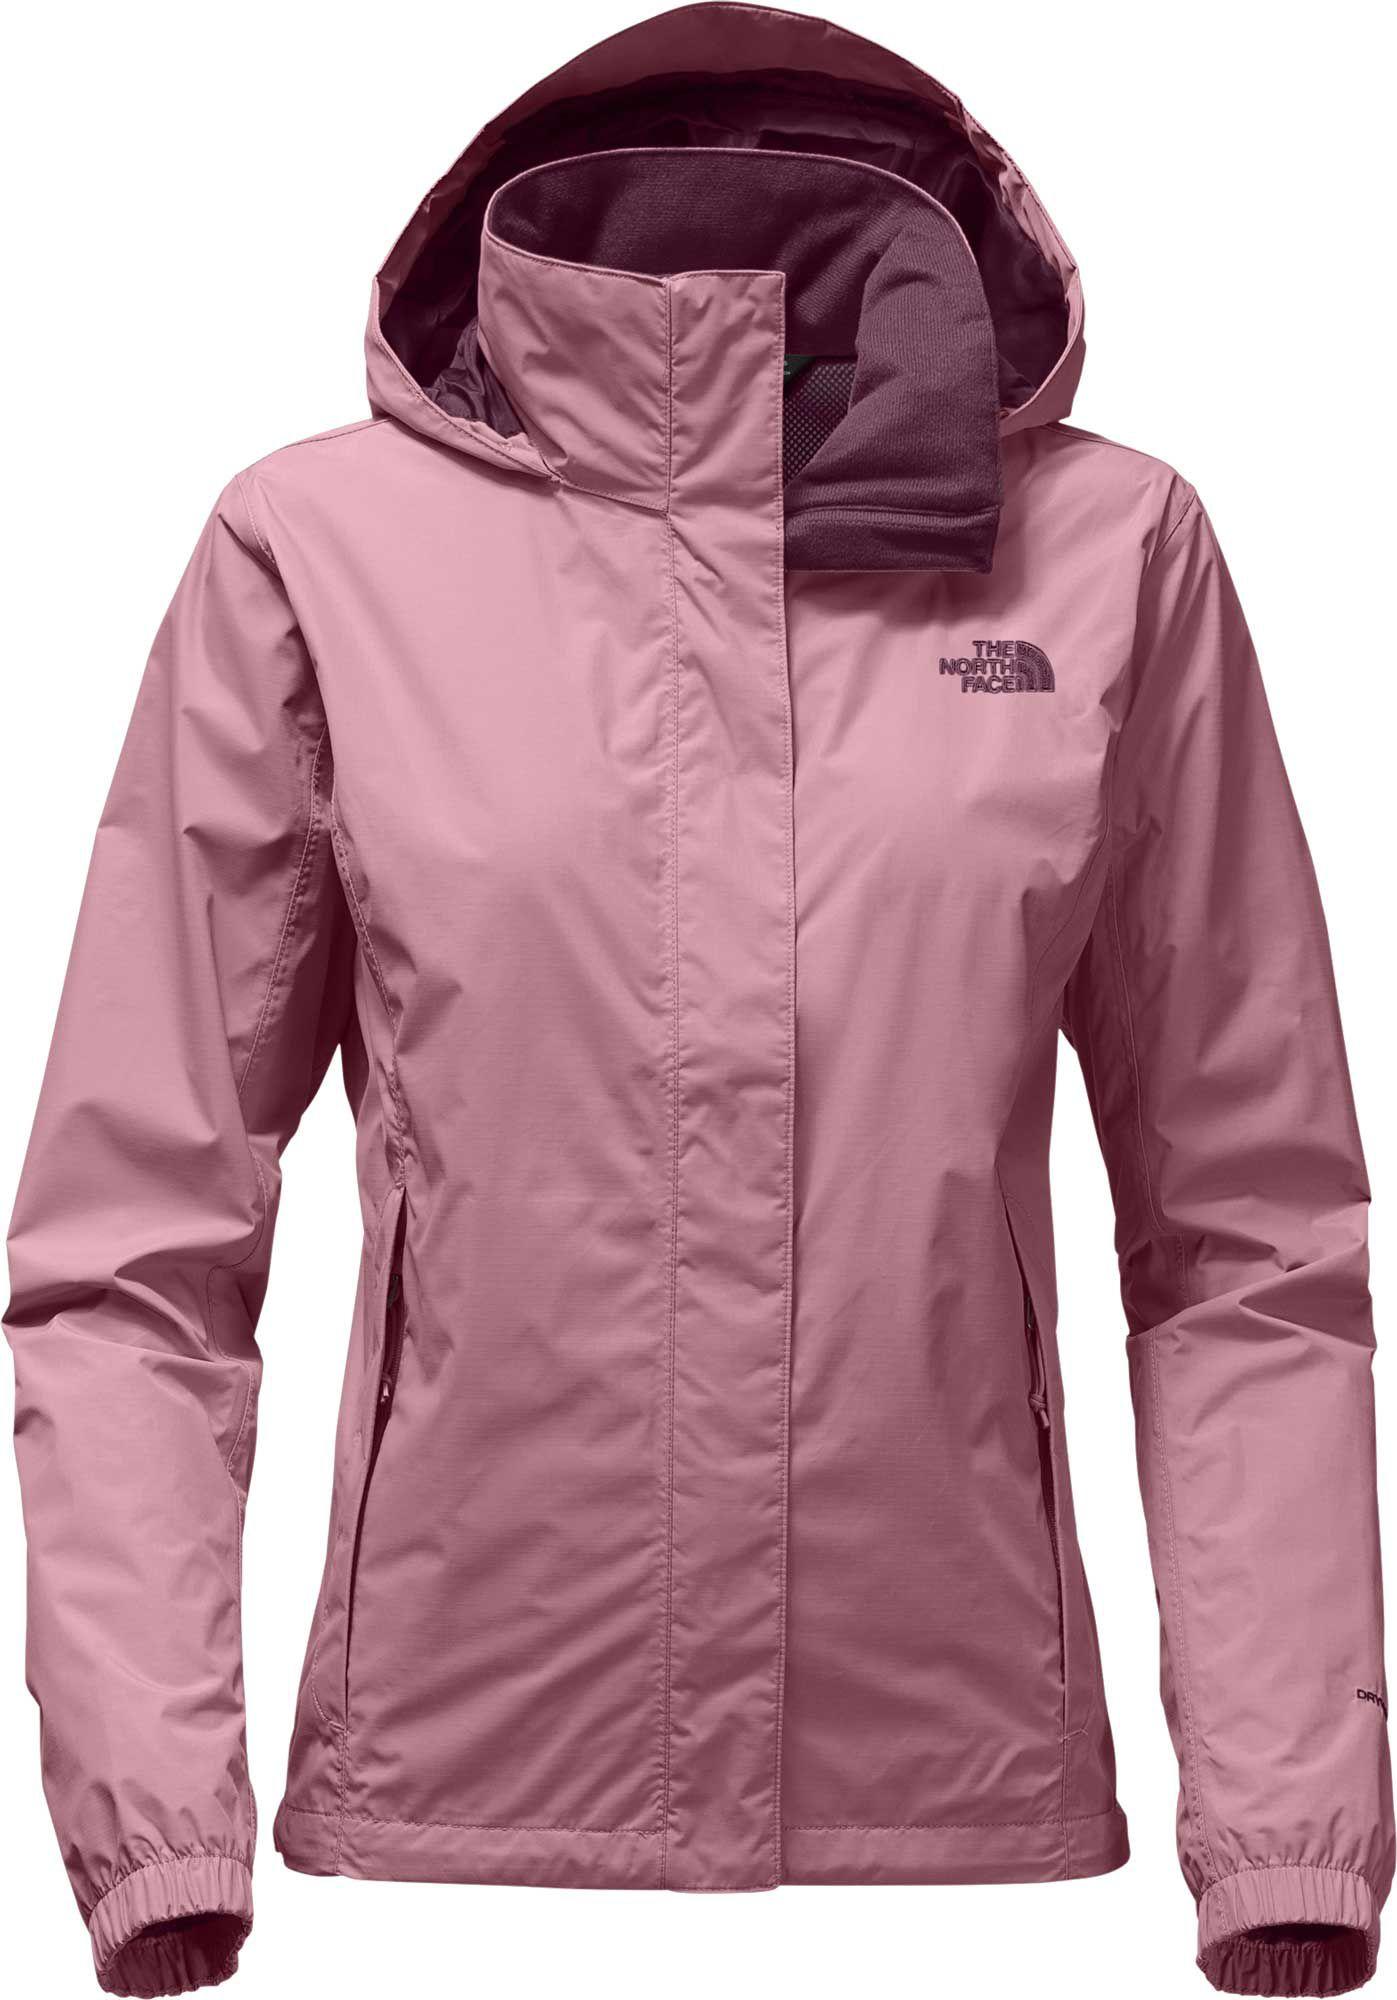 The North Face Women S Resolve 2 Rain Jacket North Face Women Jackets North Face Jacket